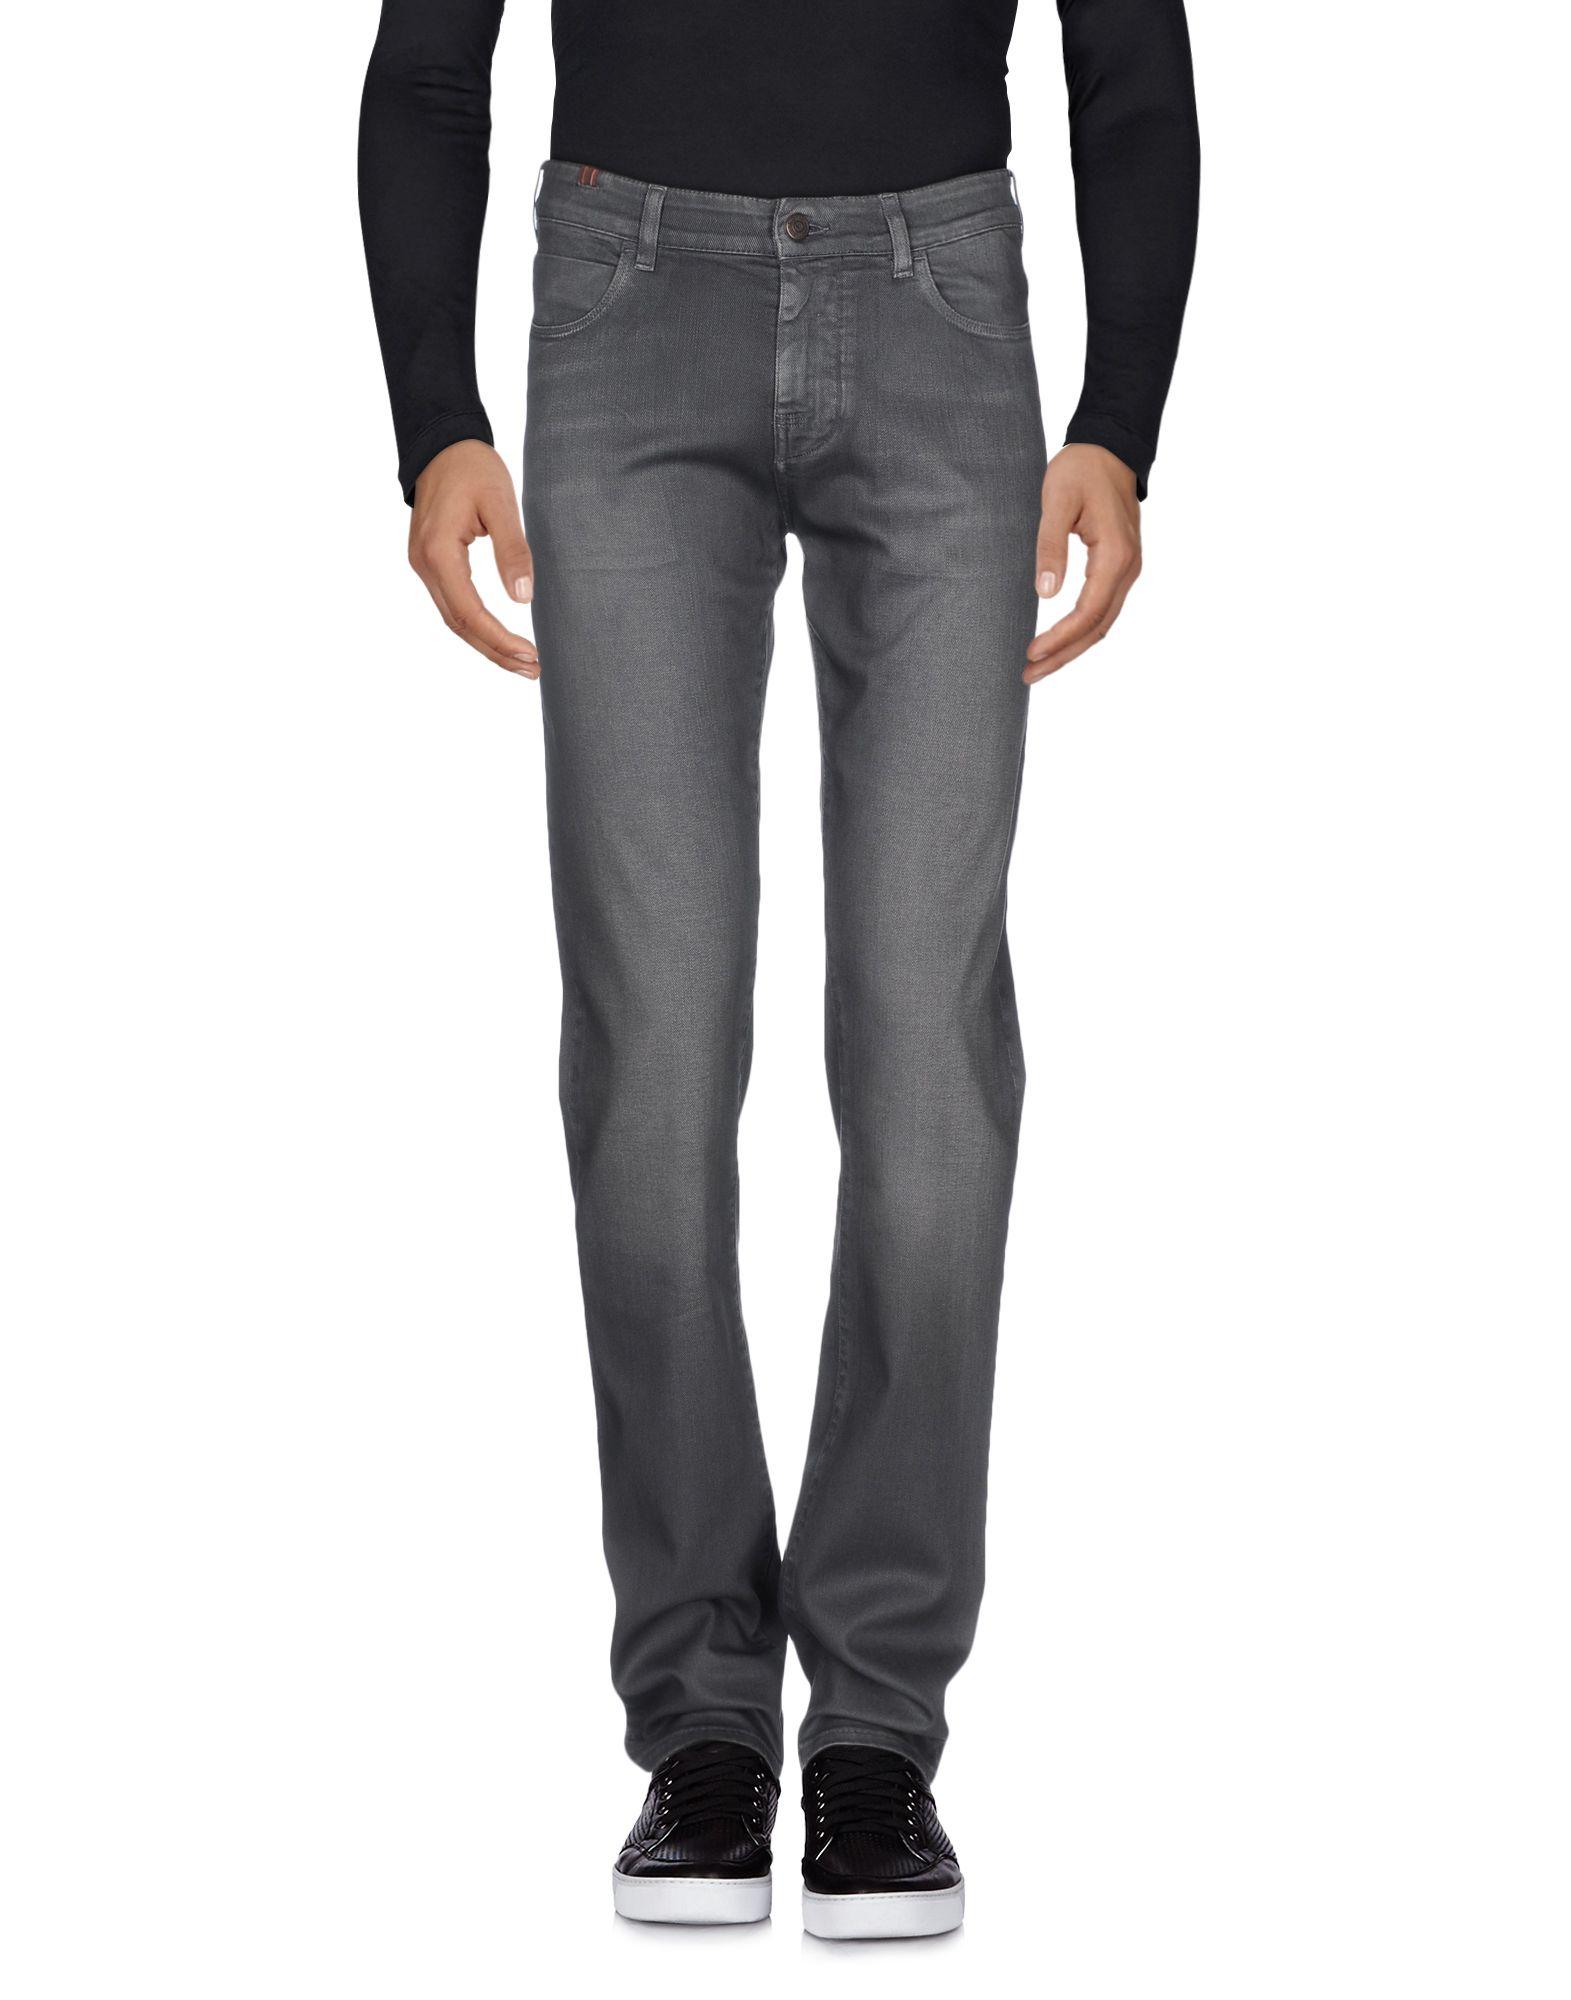 Pantaloni Jeans Notify Uomo - Acquista online su